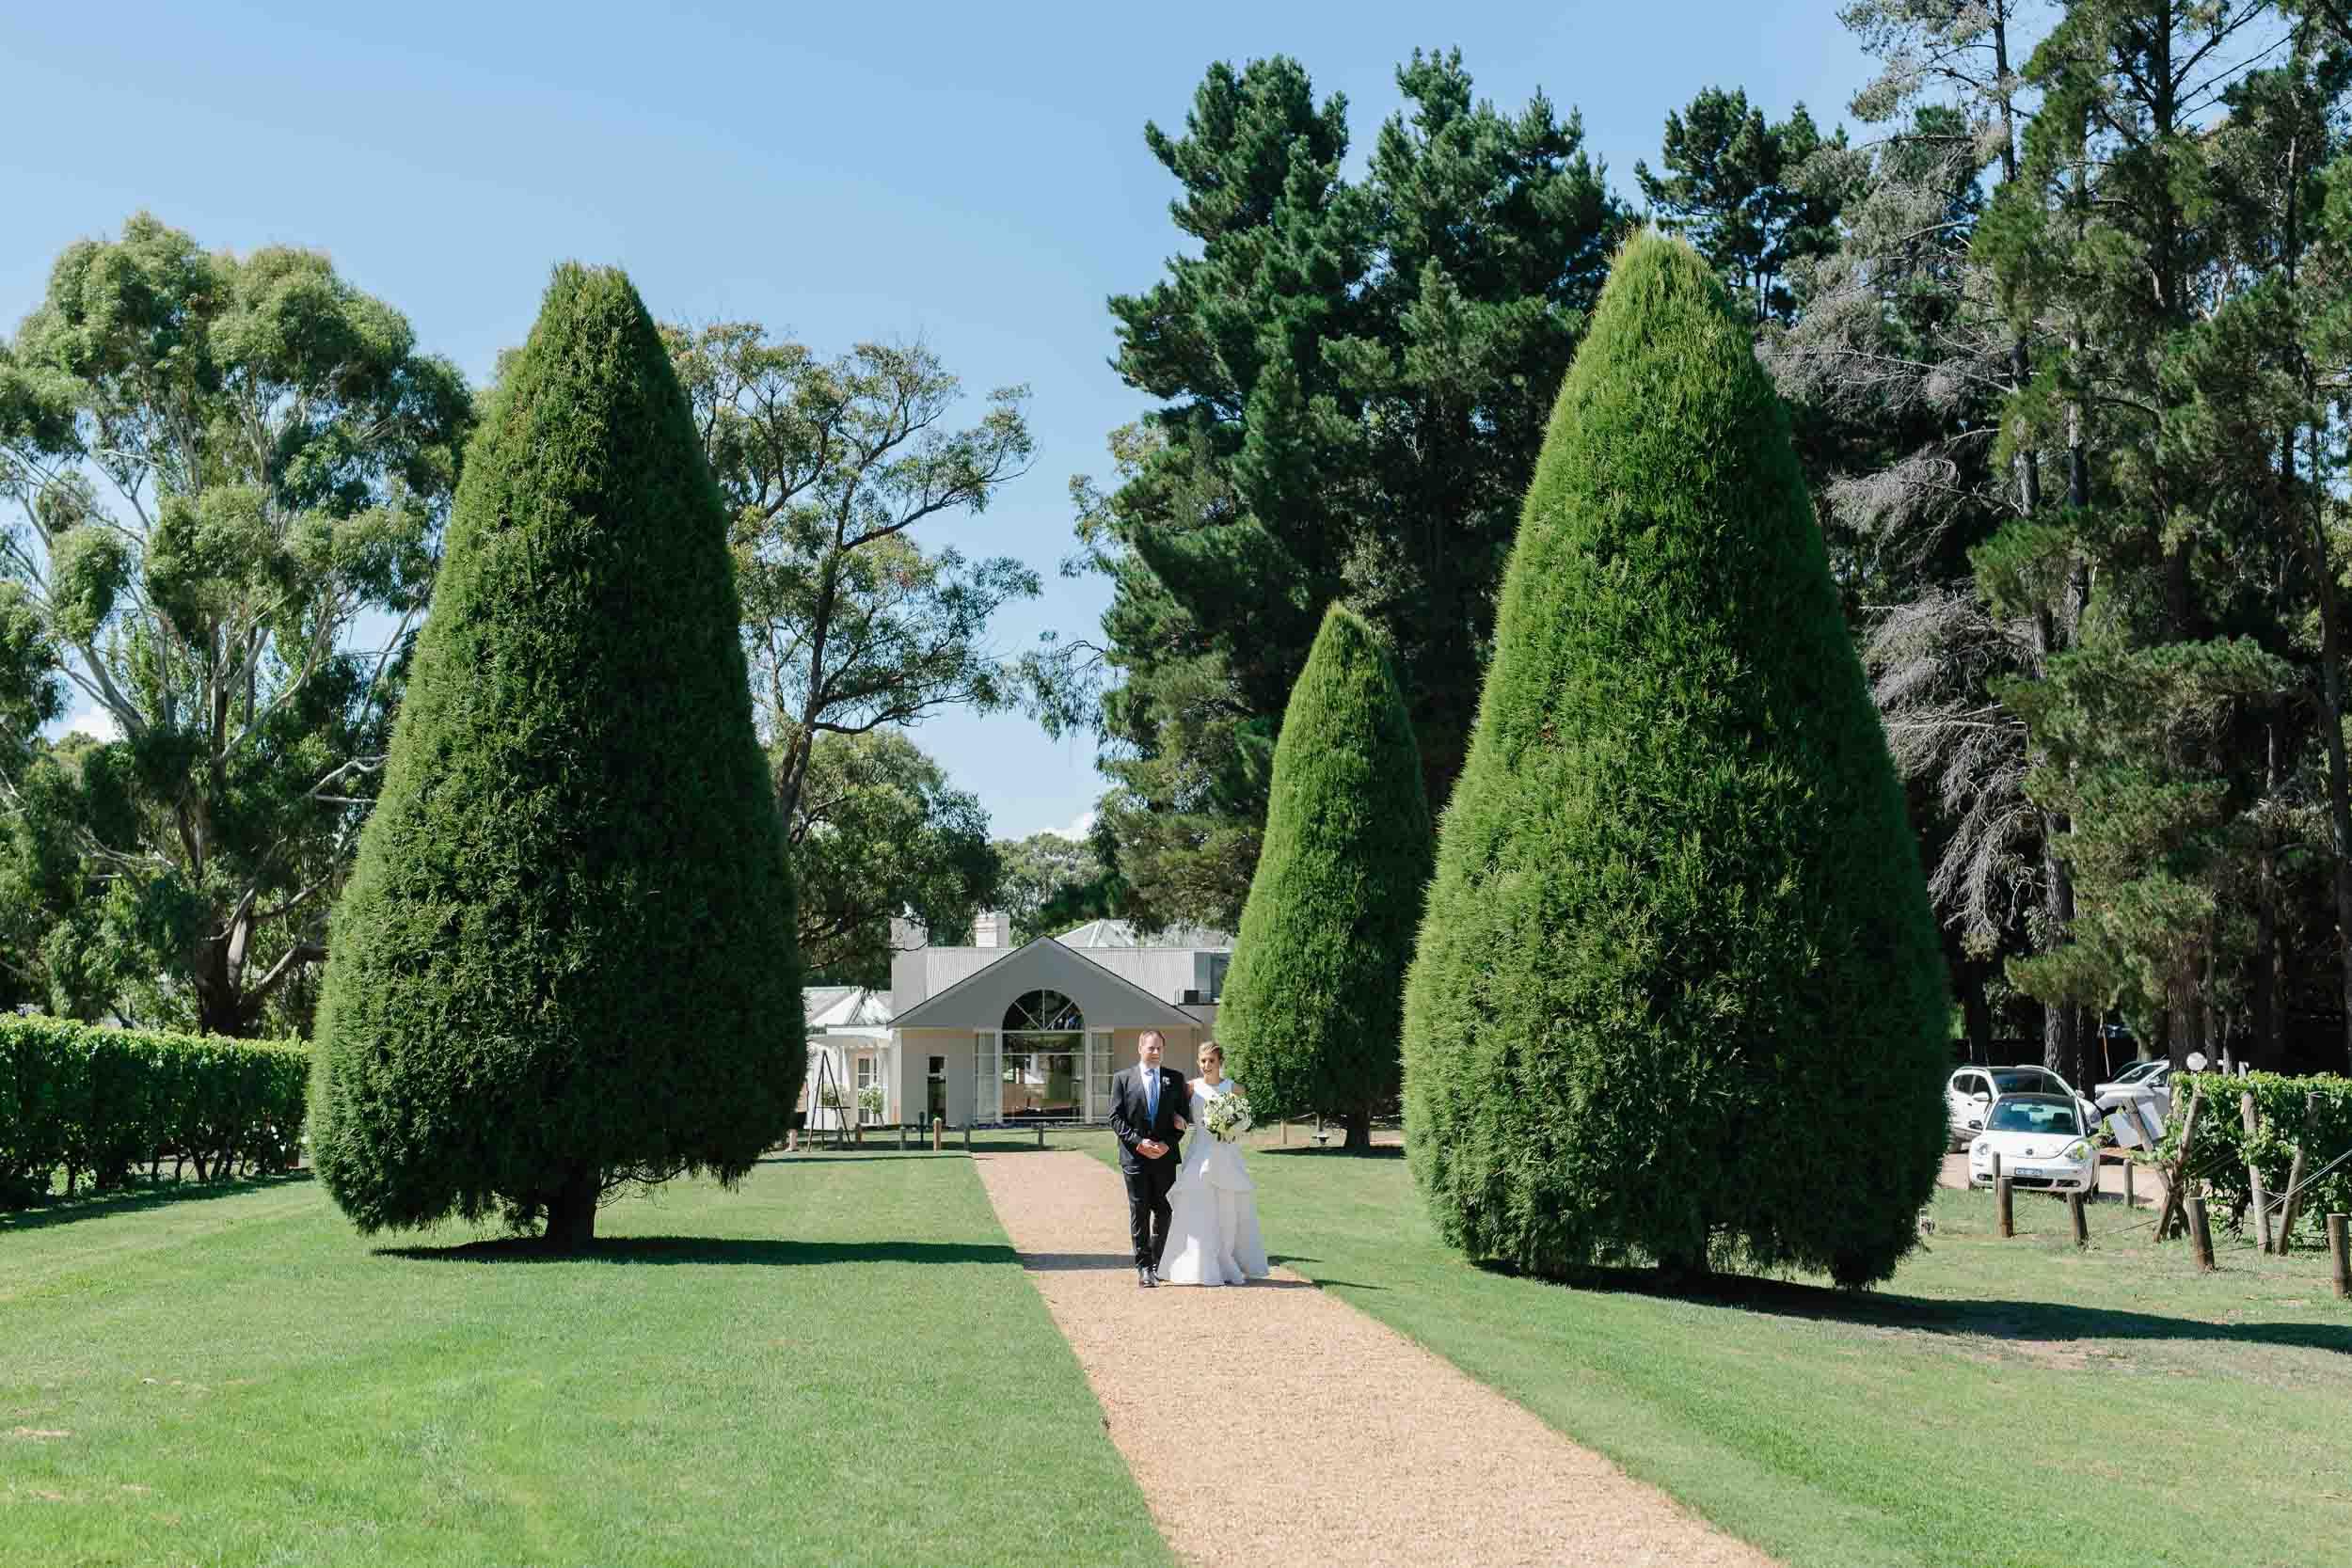 Kas-Richards-Mornington-Peninsula-Wedding-Lindenderry-Red-Hill-192.jpg